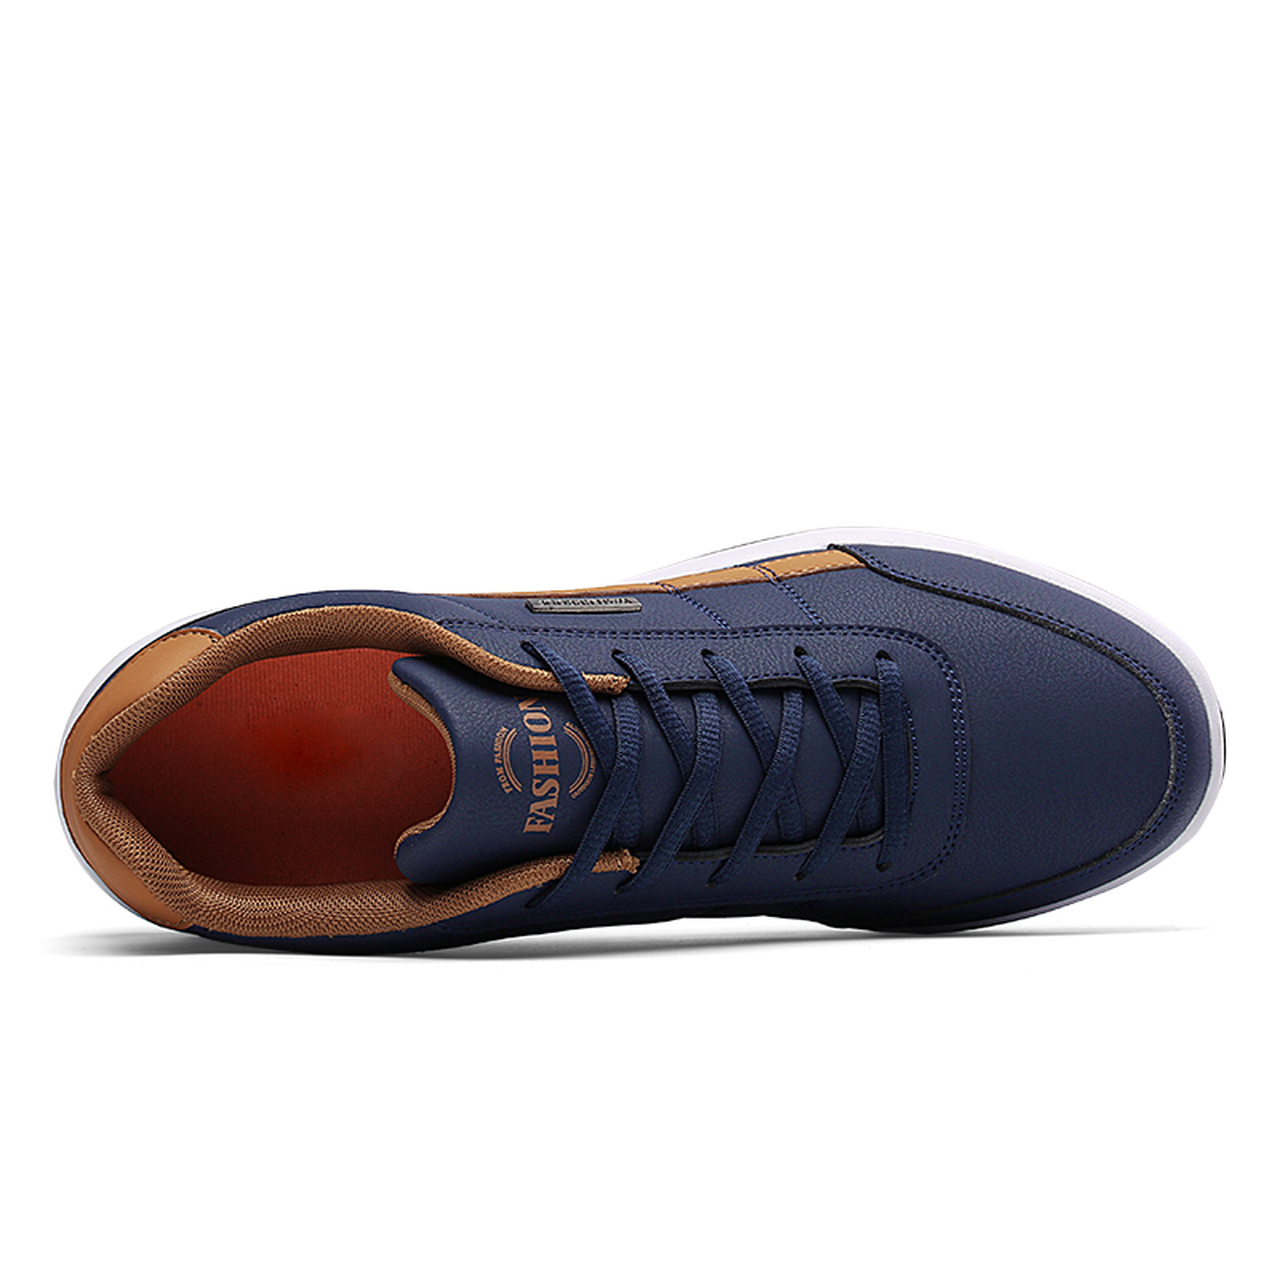 AODLEE Fashion Men Sneakers for Men